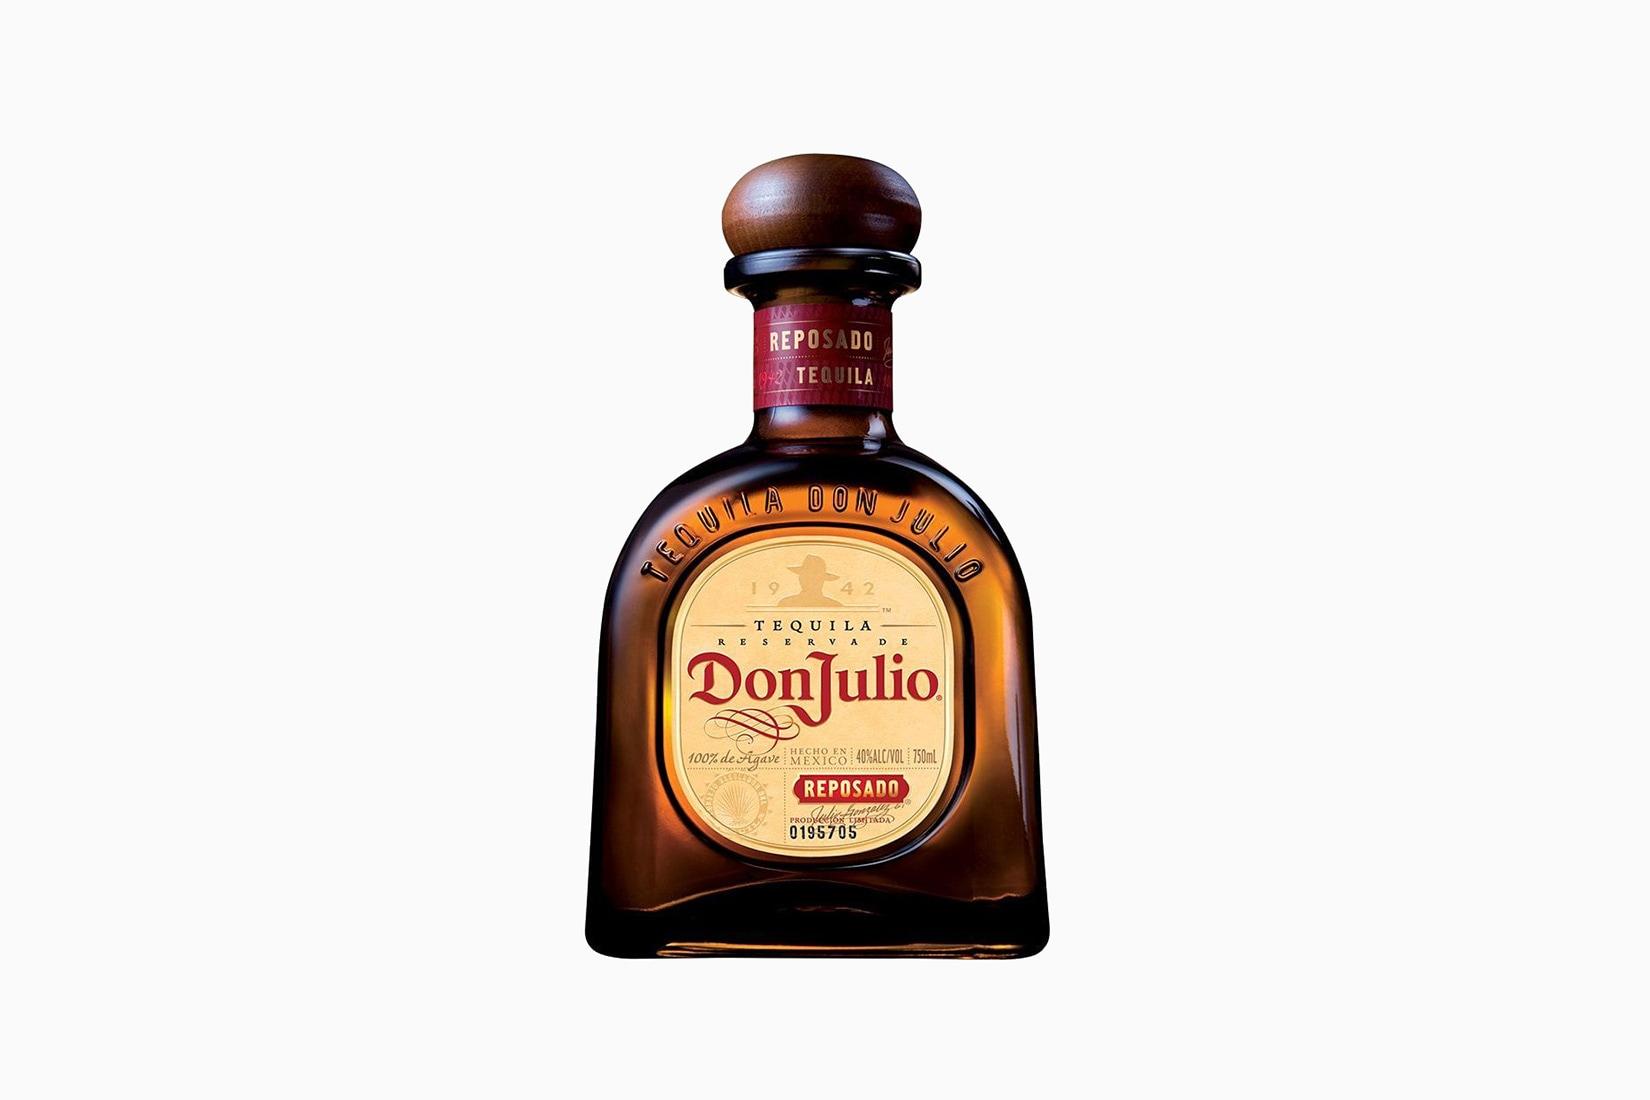 don julio bottle price size - Luxe Digital